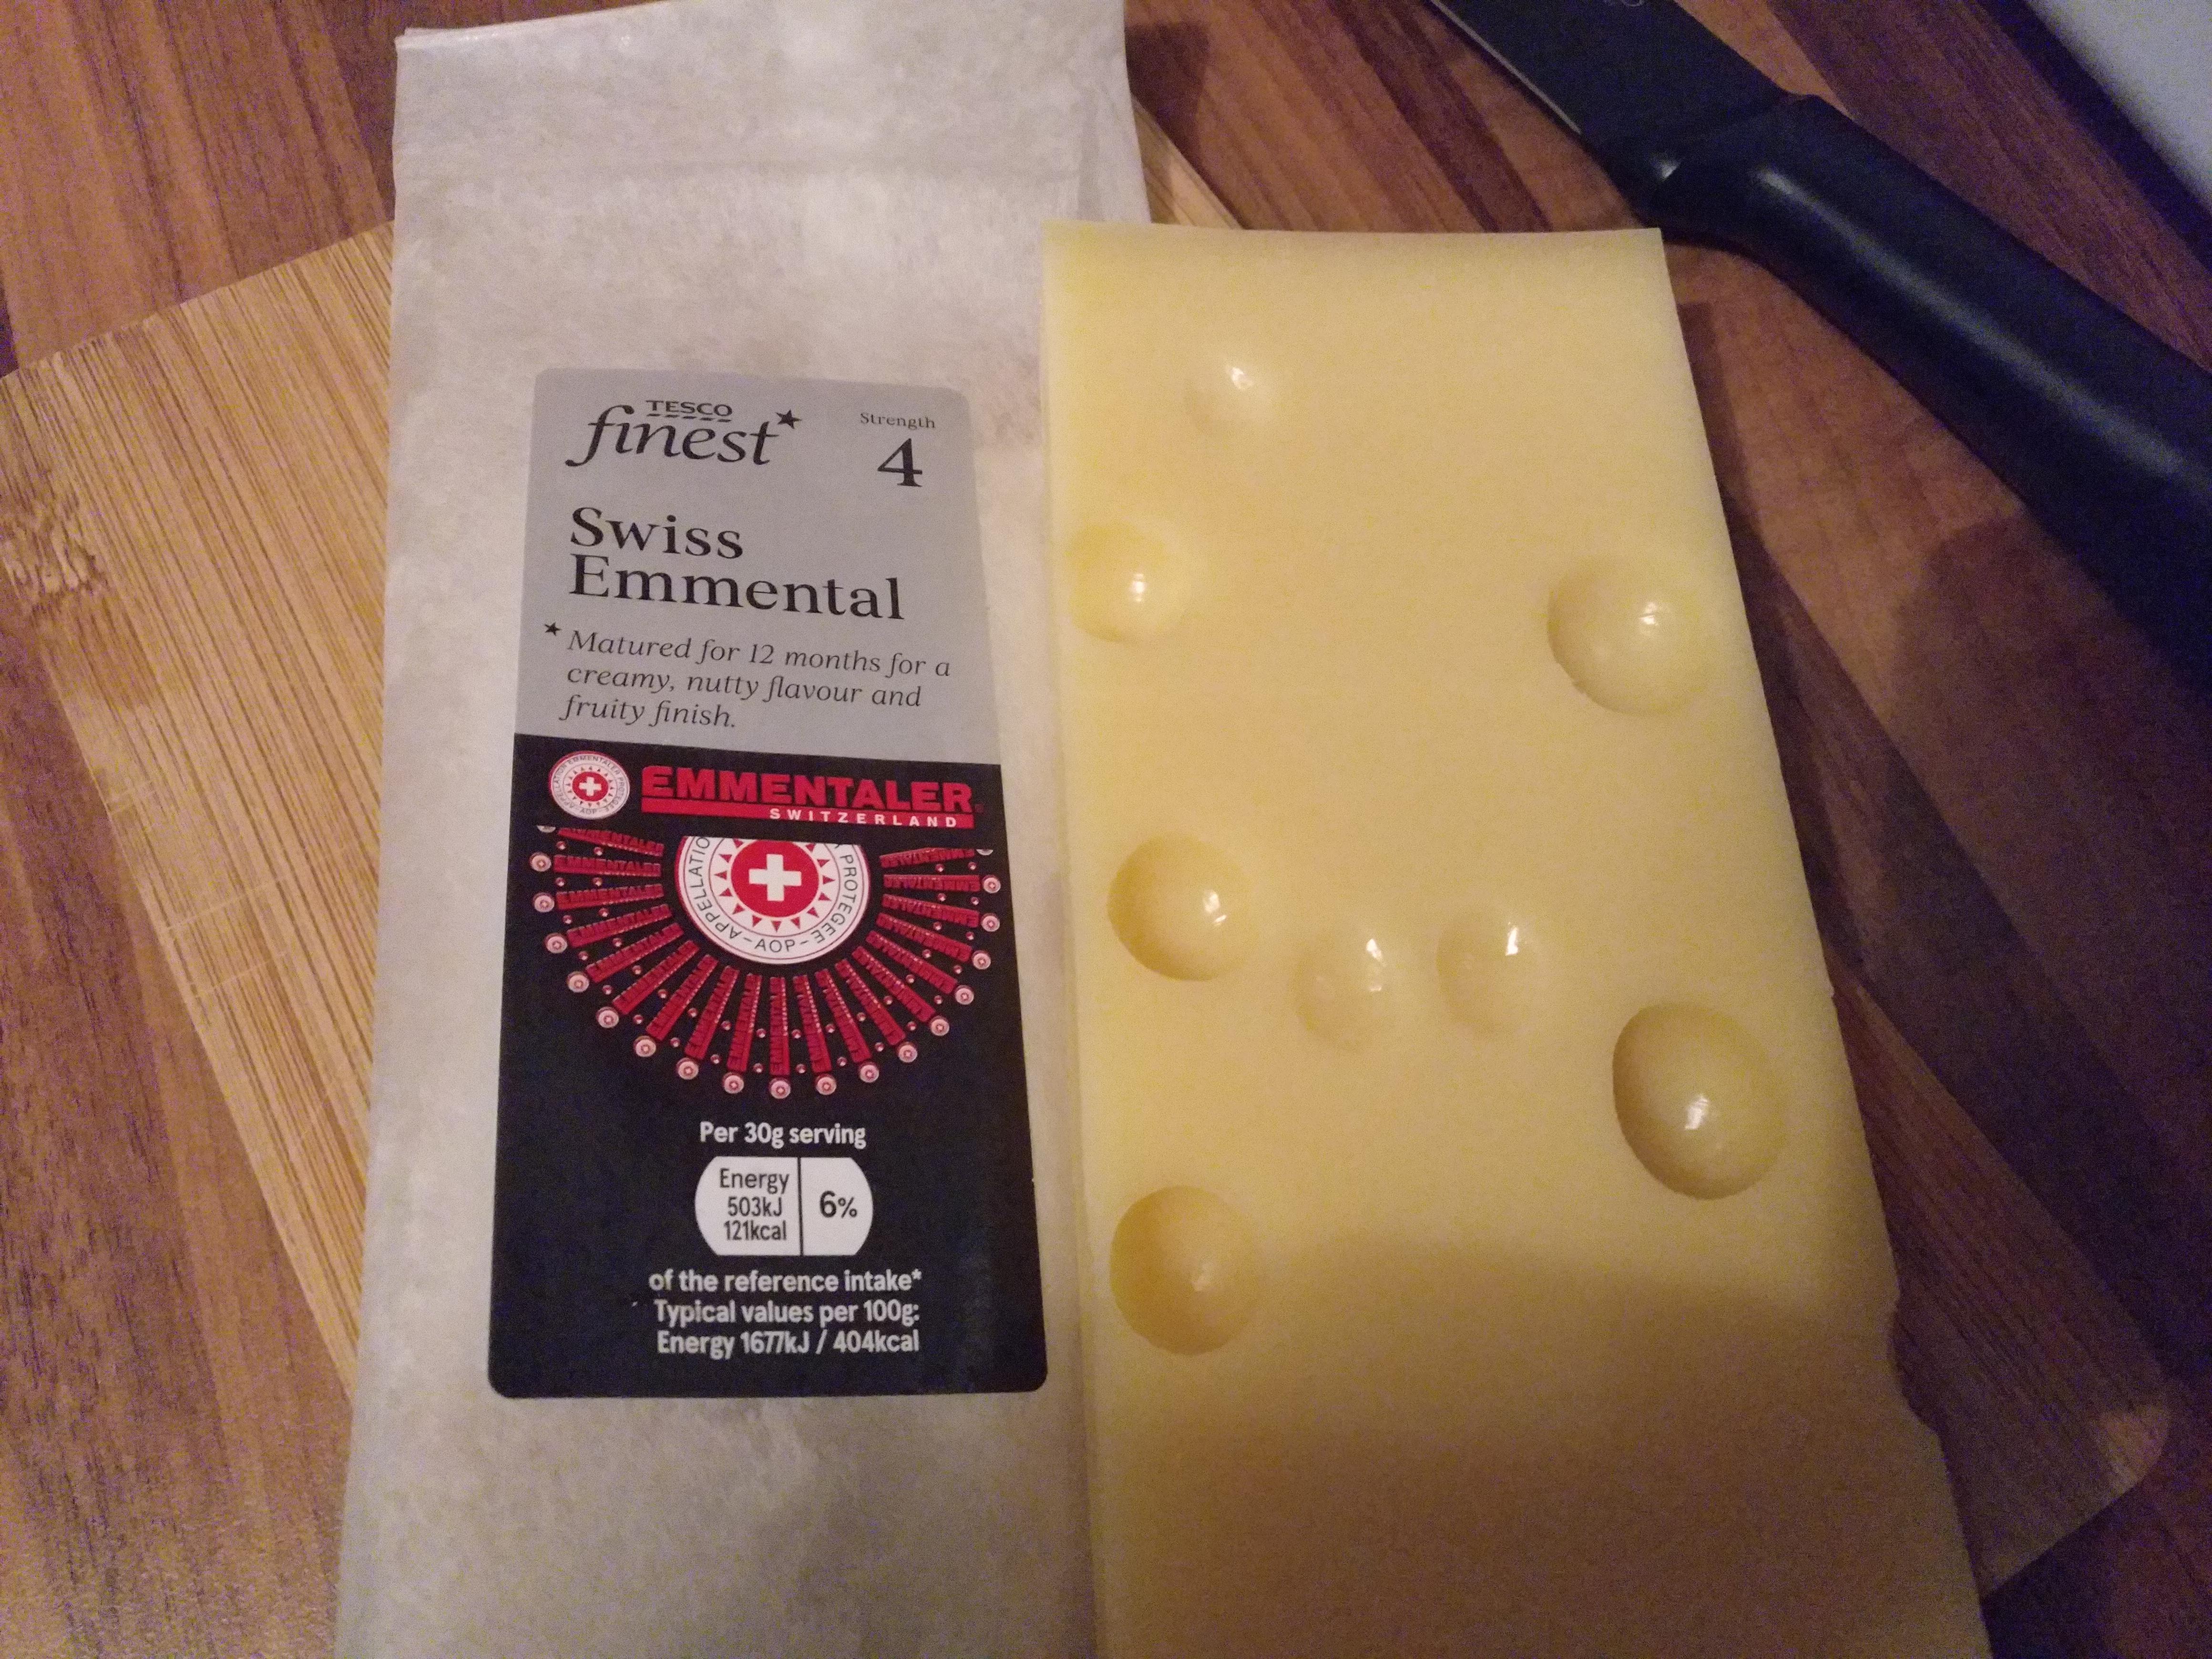 Swiss Emmental